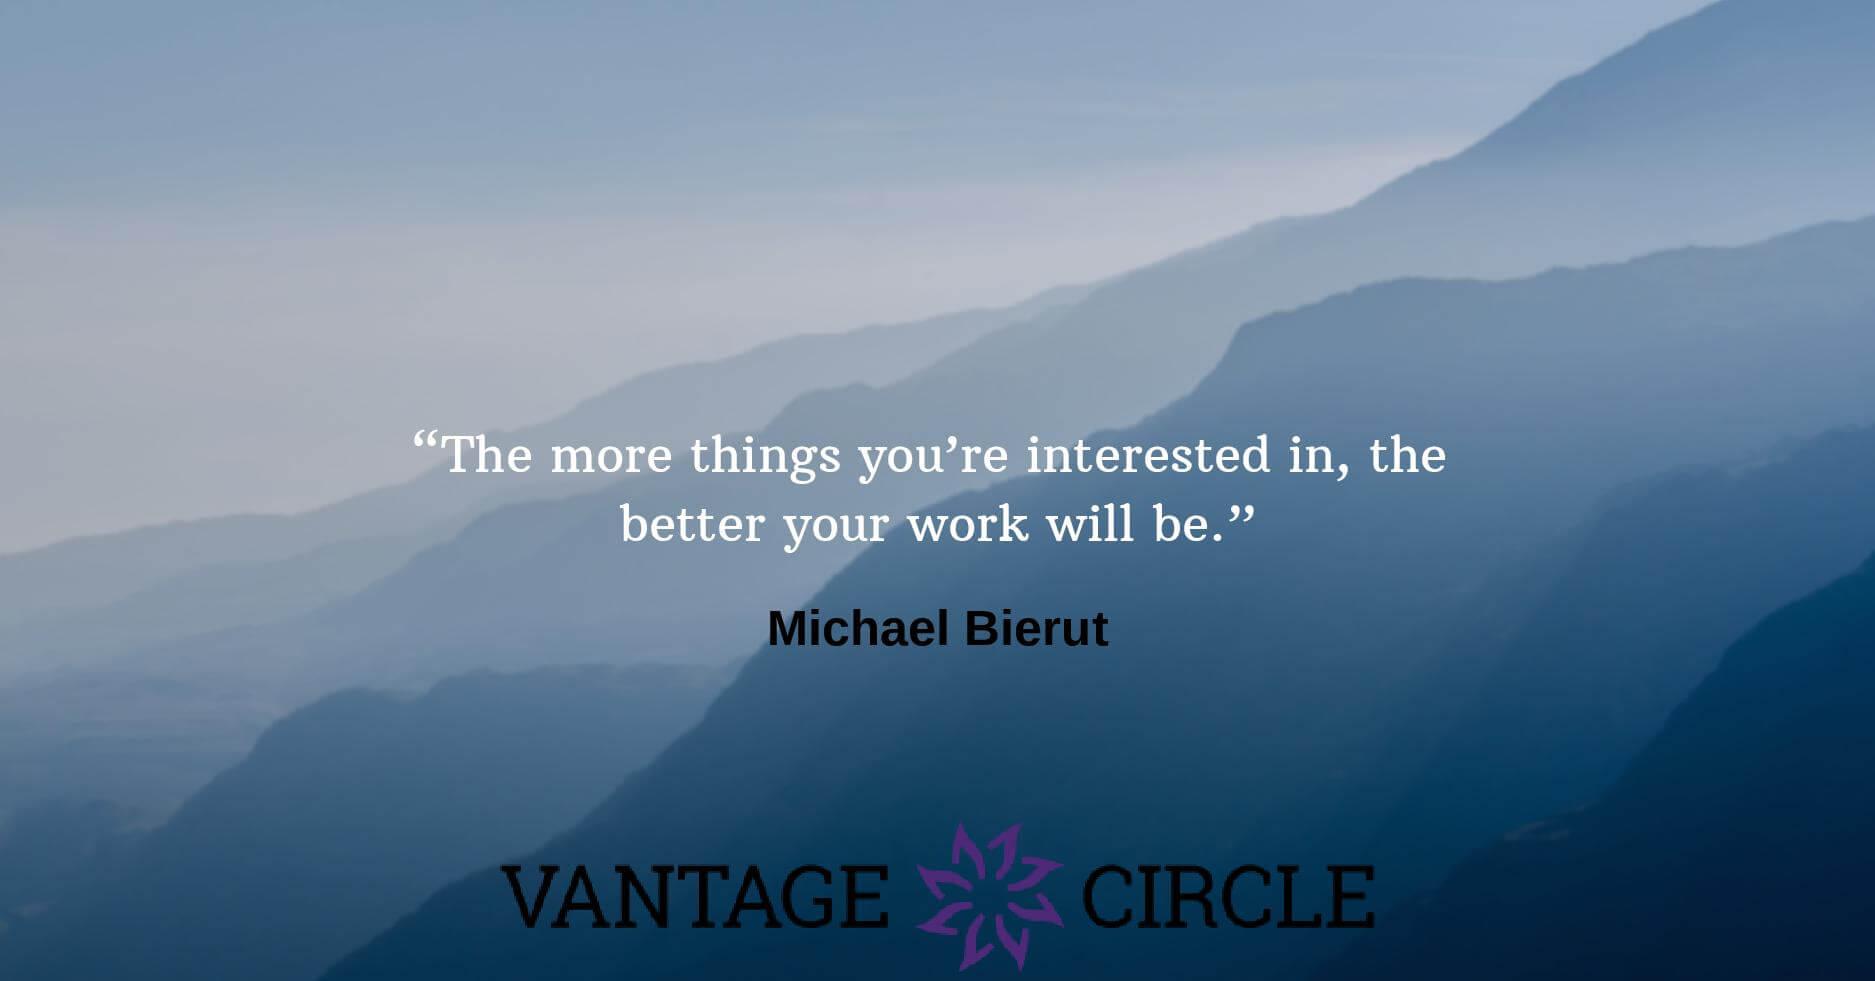 Employee-motivational-quotes-Michael-Bierut